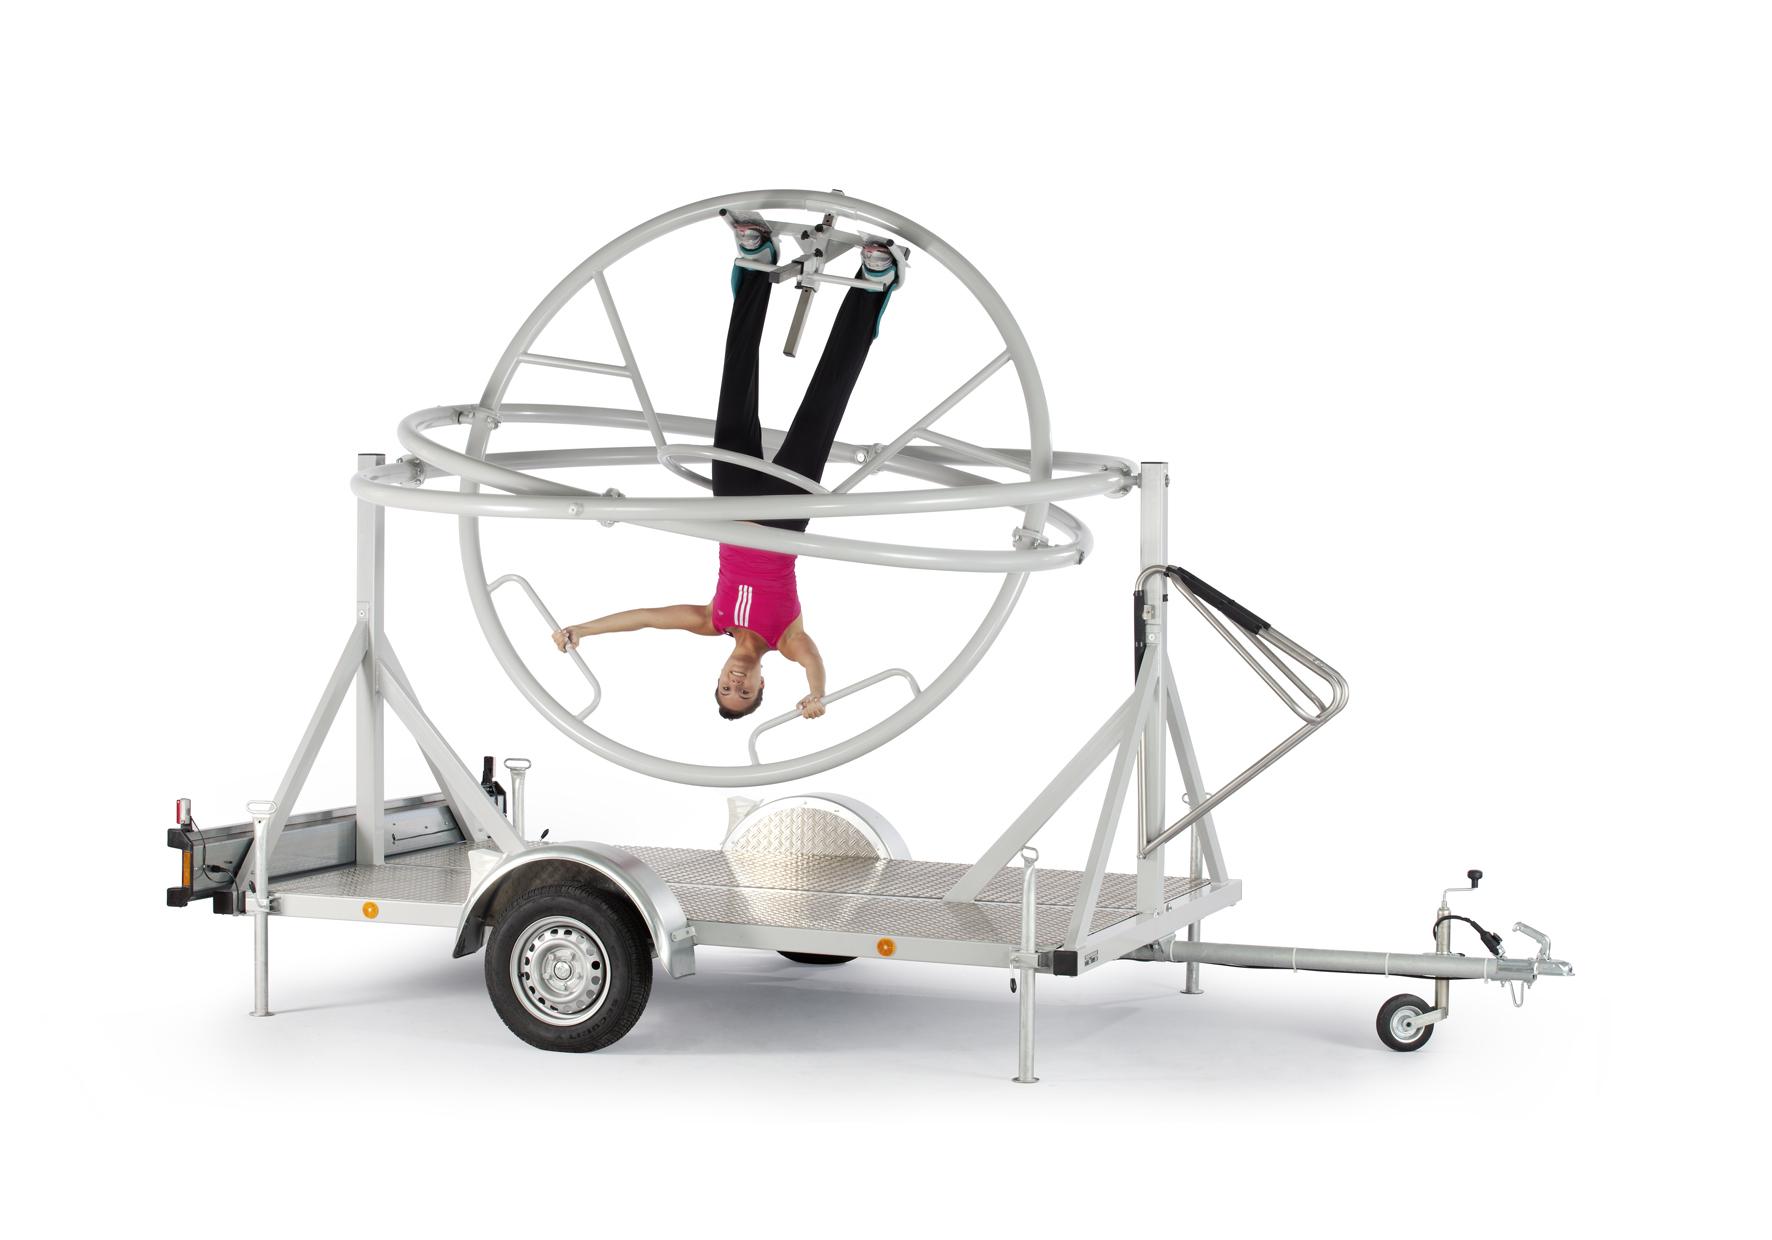 Aerotrim Fun Sport Herausforderung 2